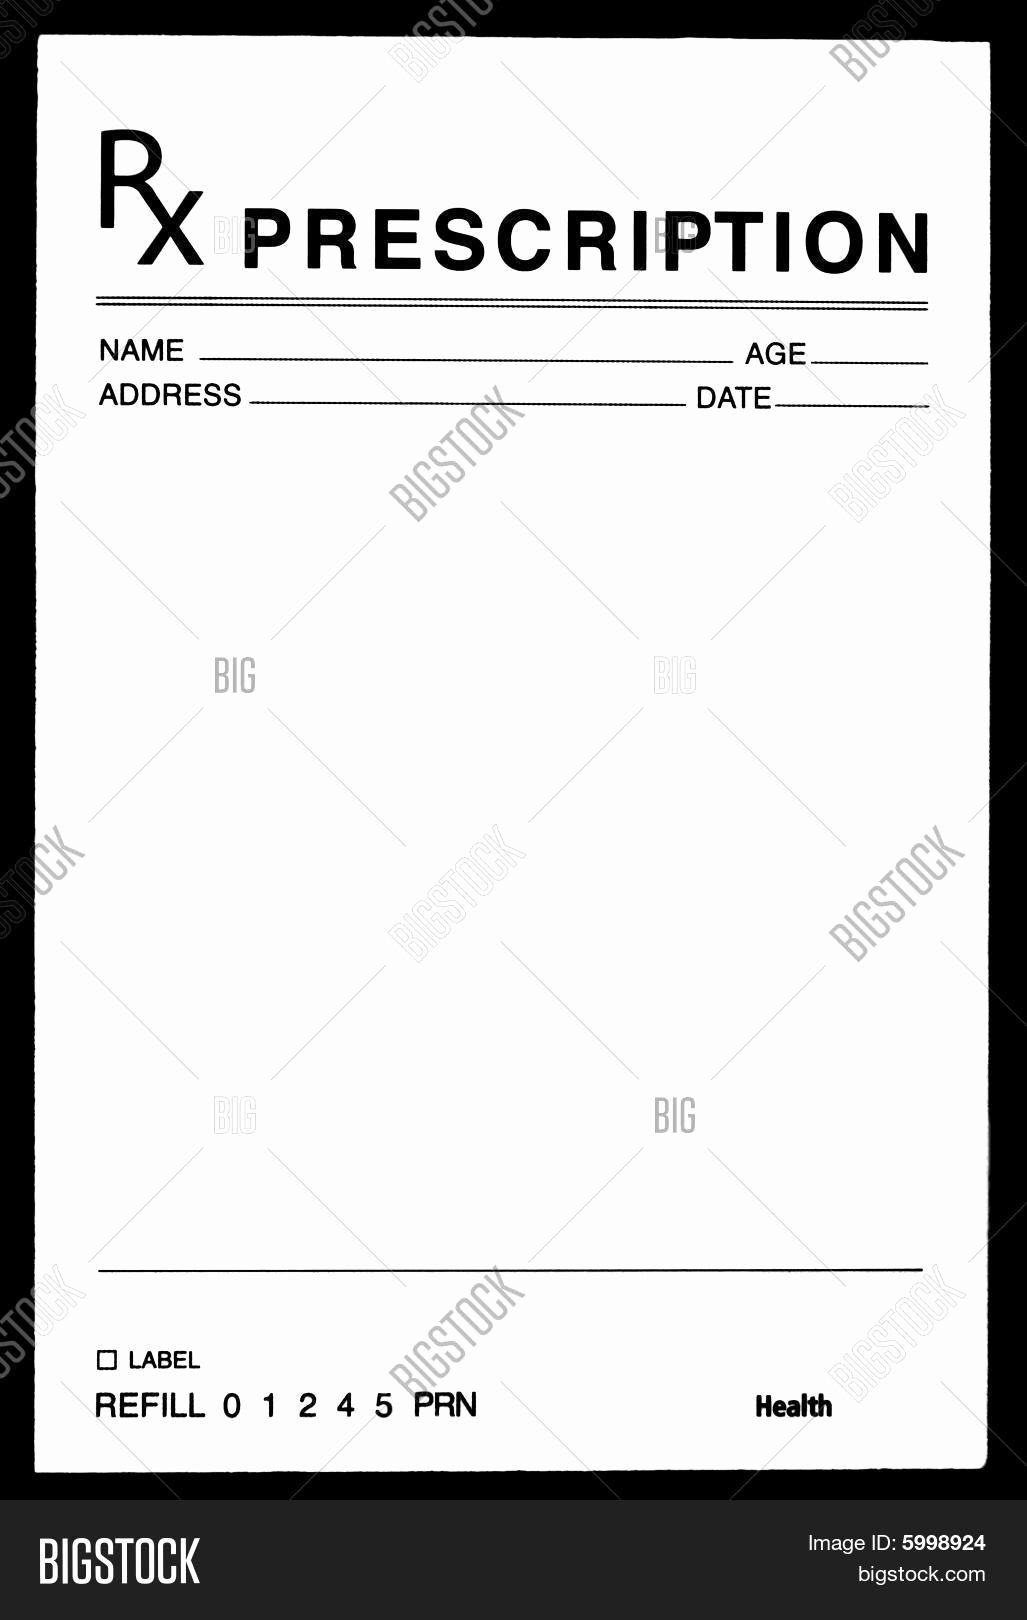 Prescription Pad Template Microsoft Word Luxury Blank Prescription form Image Cg5p C